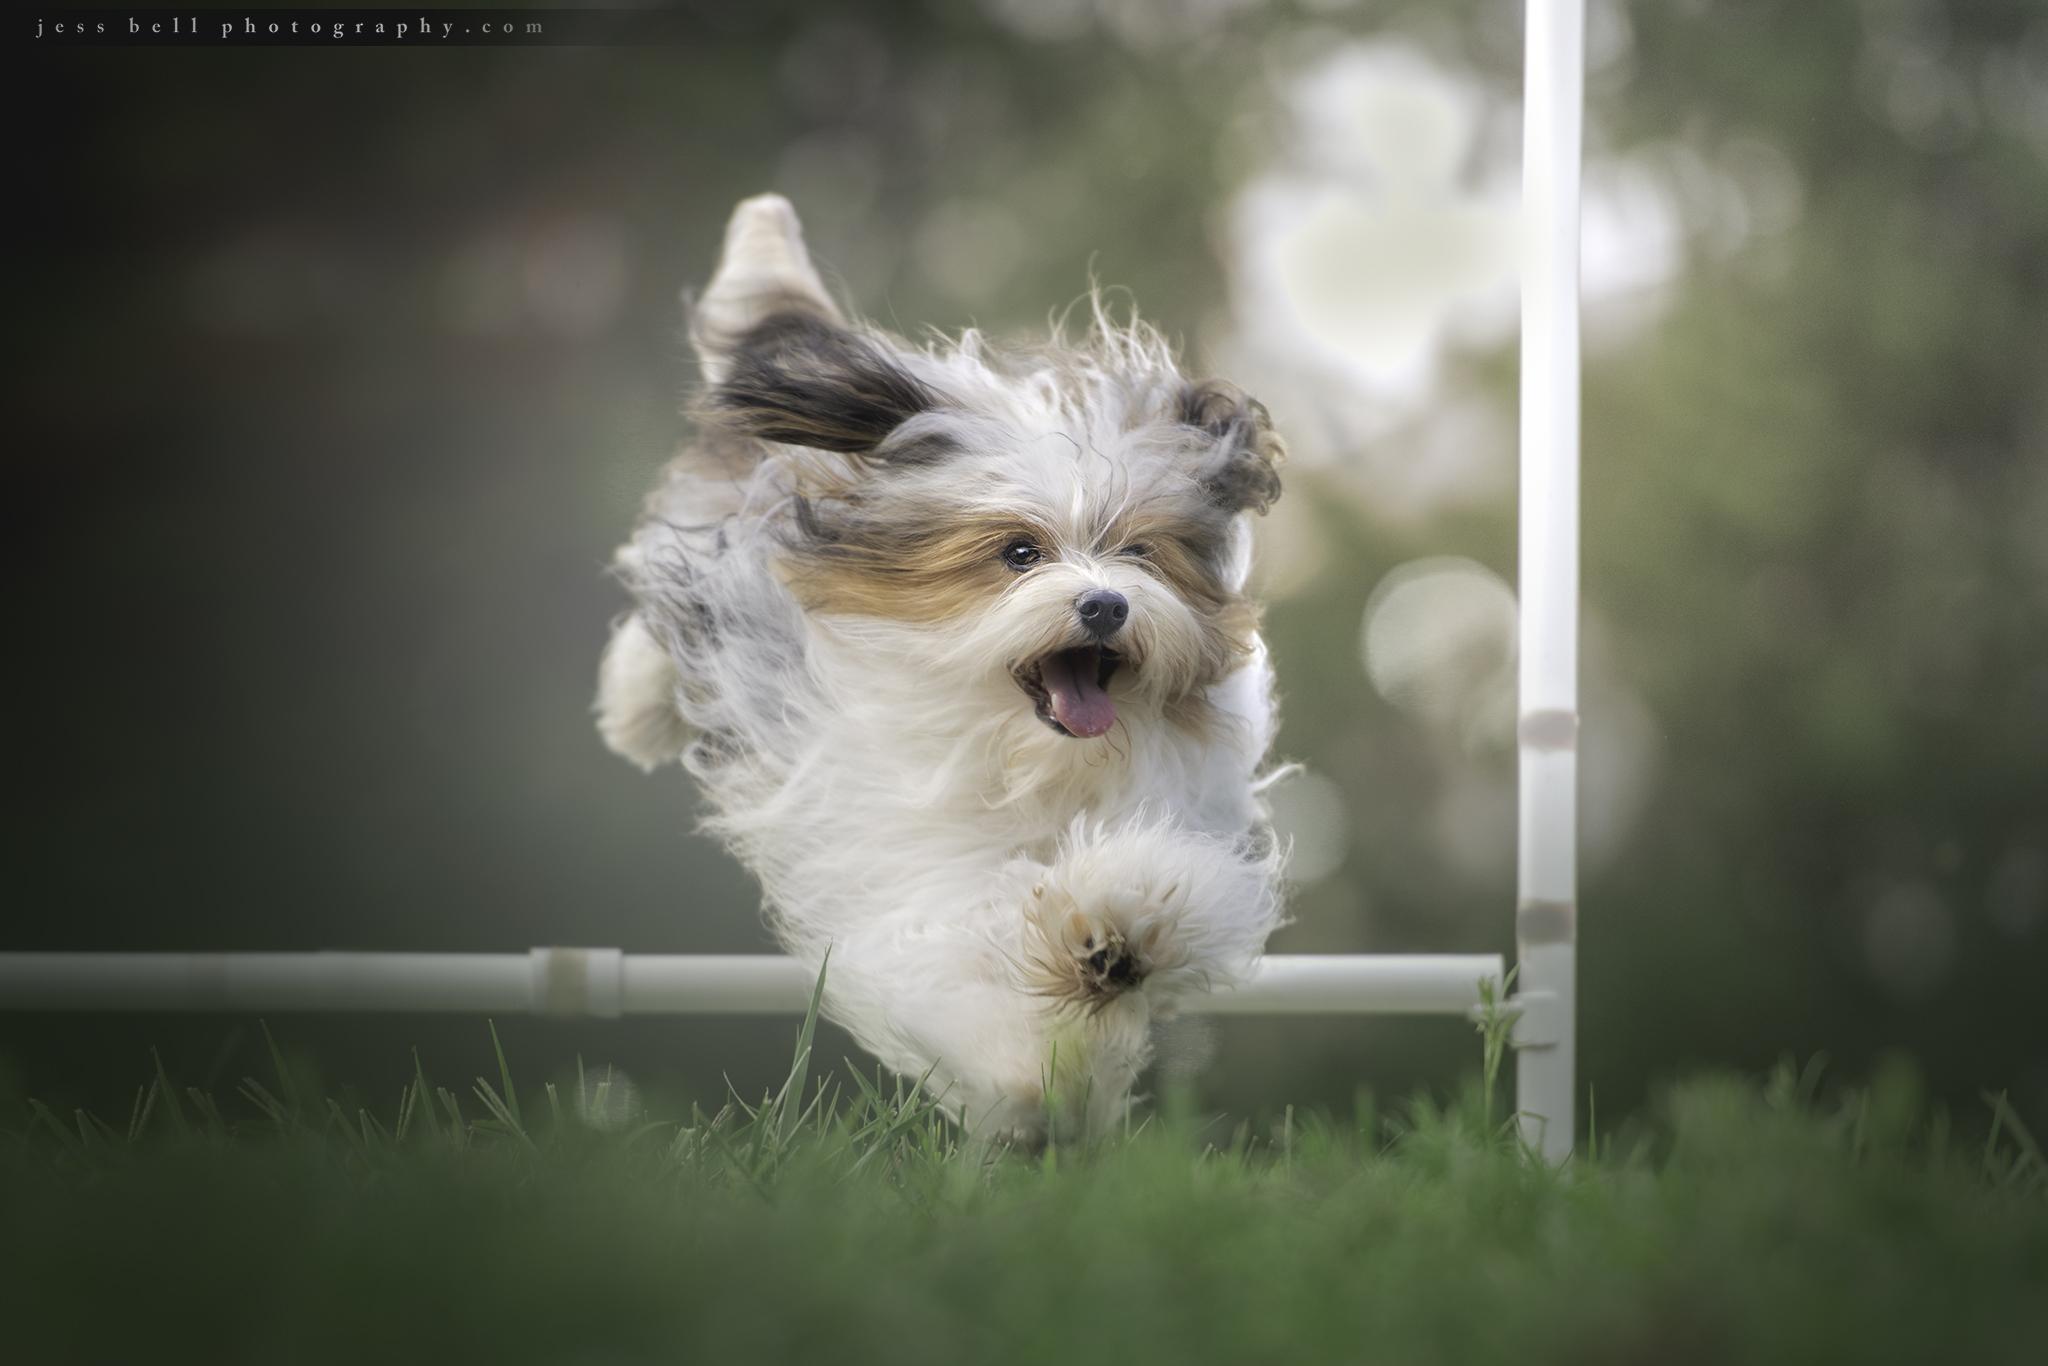 Jess Bell Photography -Indy jump watermark.jpg